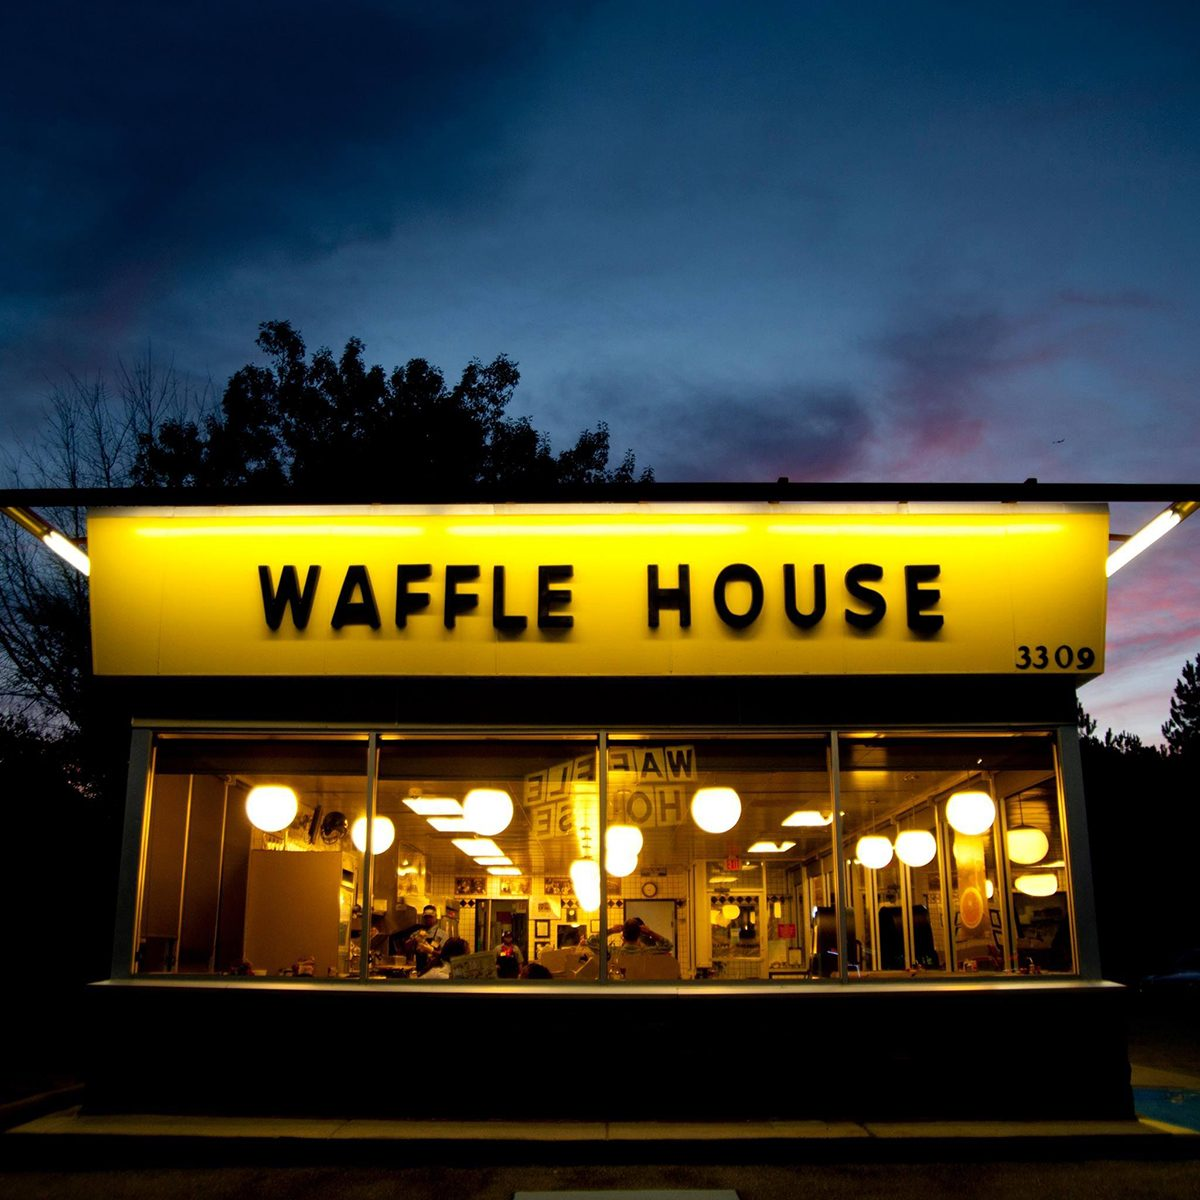 Outside of a Waffle House